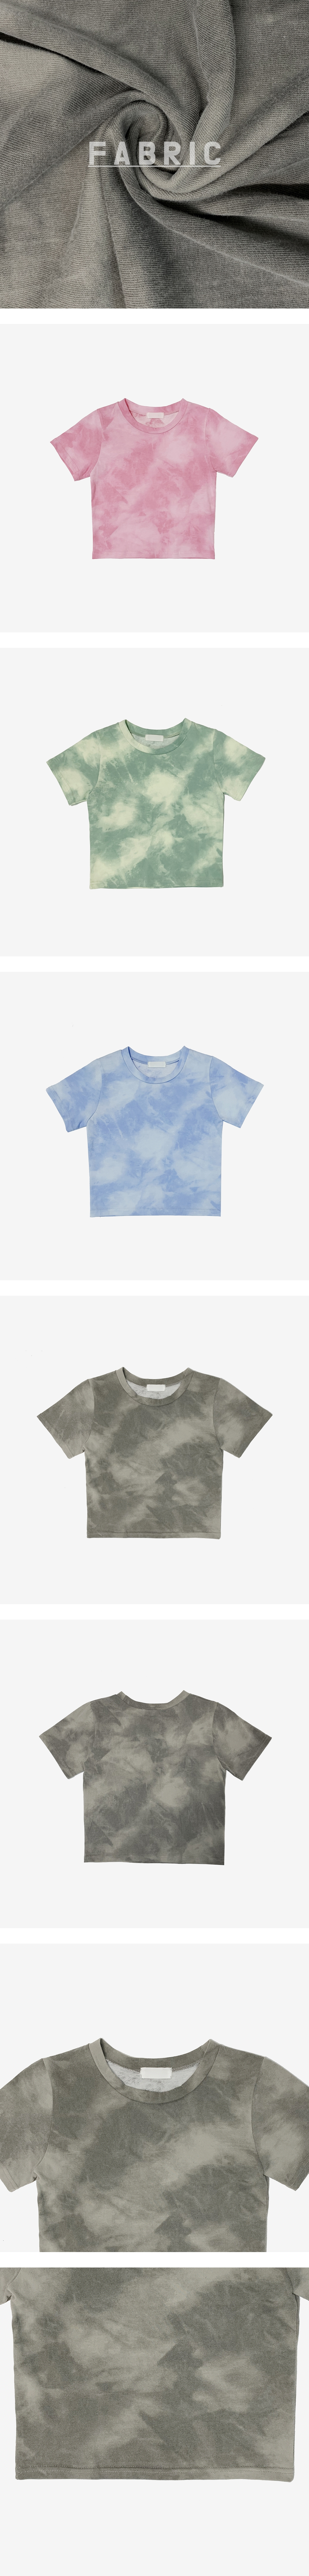 Gambit tie-dye cropped T-shirt